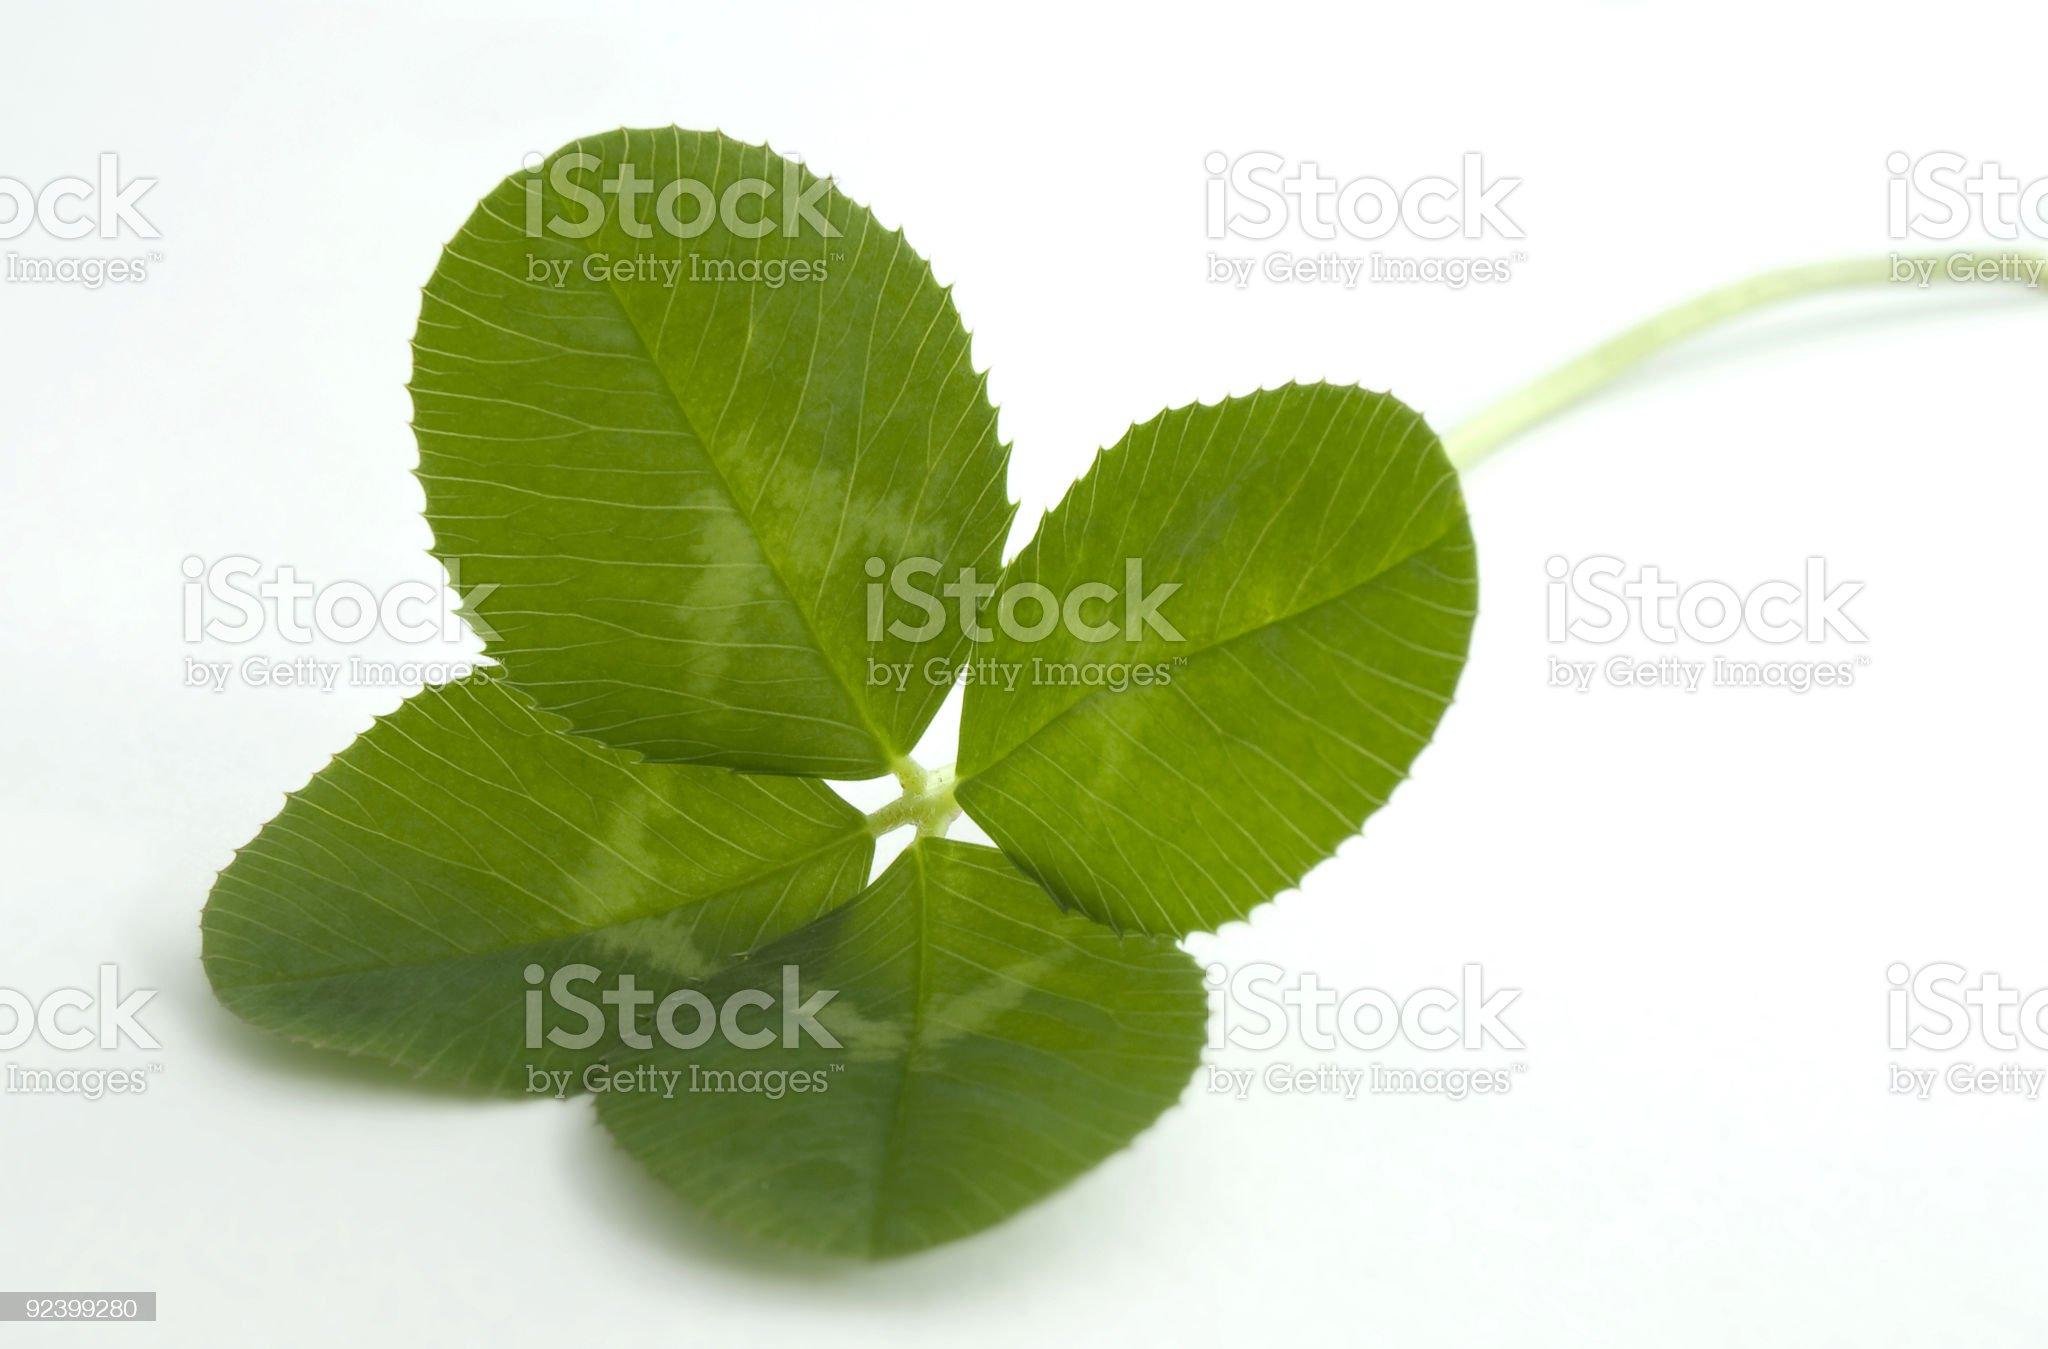 Four leaf clover on white royalty-free stock photo